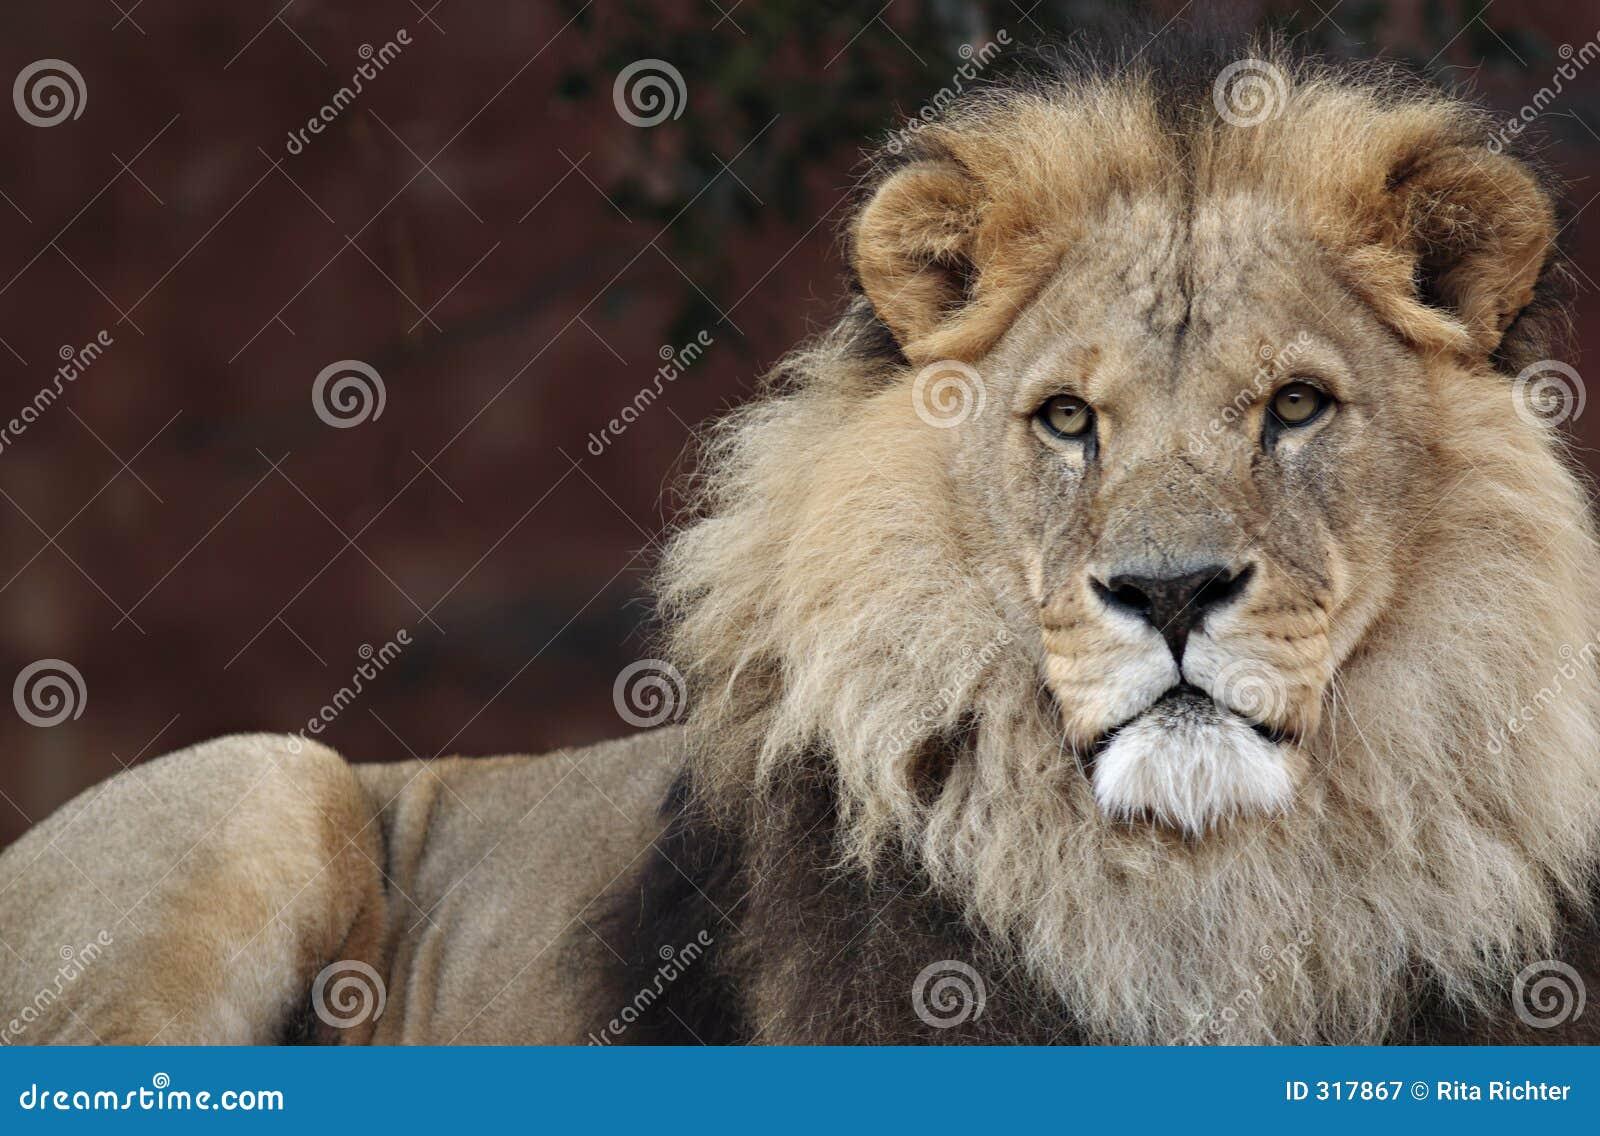 Lew majestic